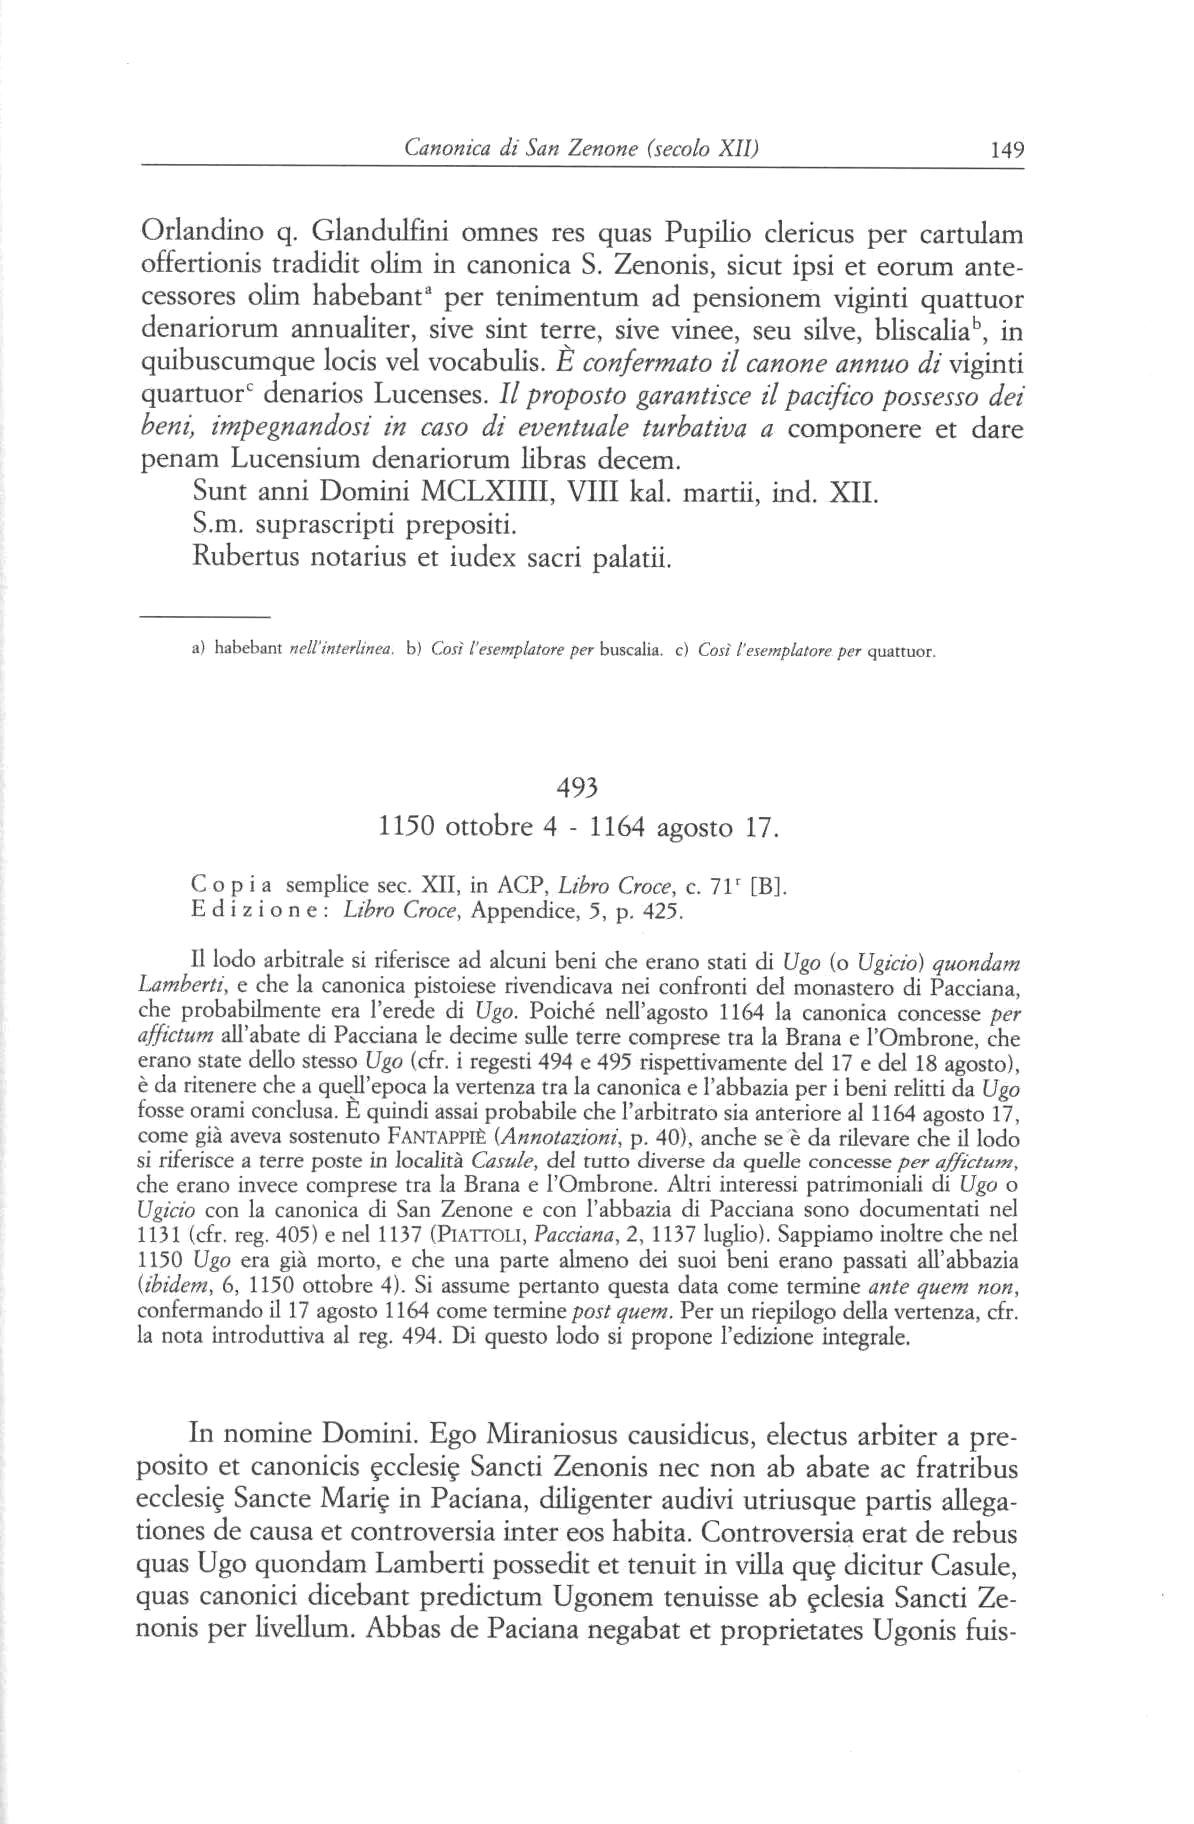 Canonica S. Zenone XII 0149.jpg